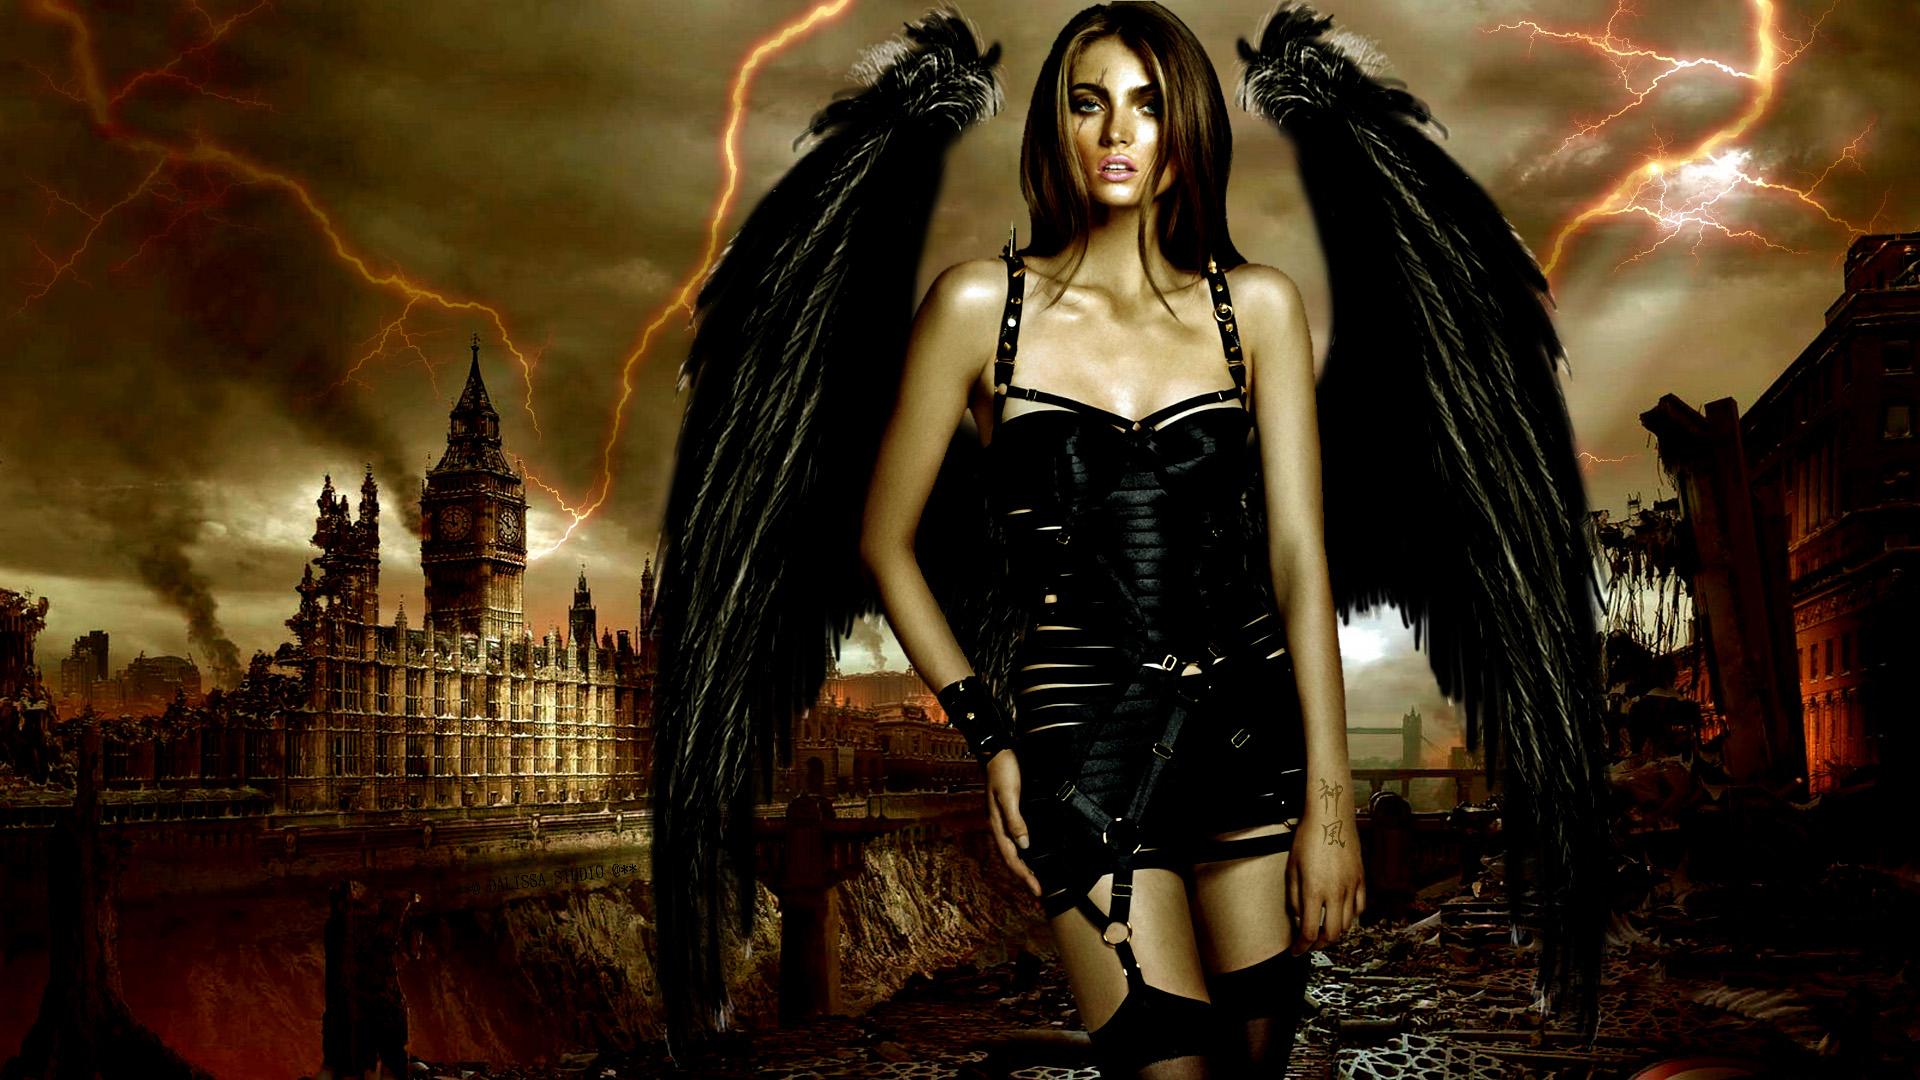 Dark horror sci fi fantasy gothic apocalyptic post angel wings 1920x1080